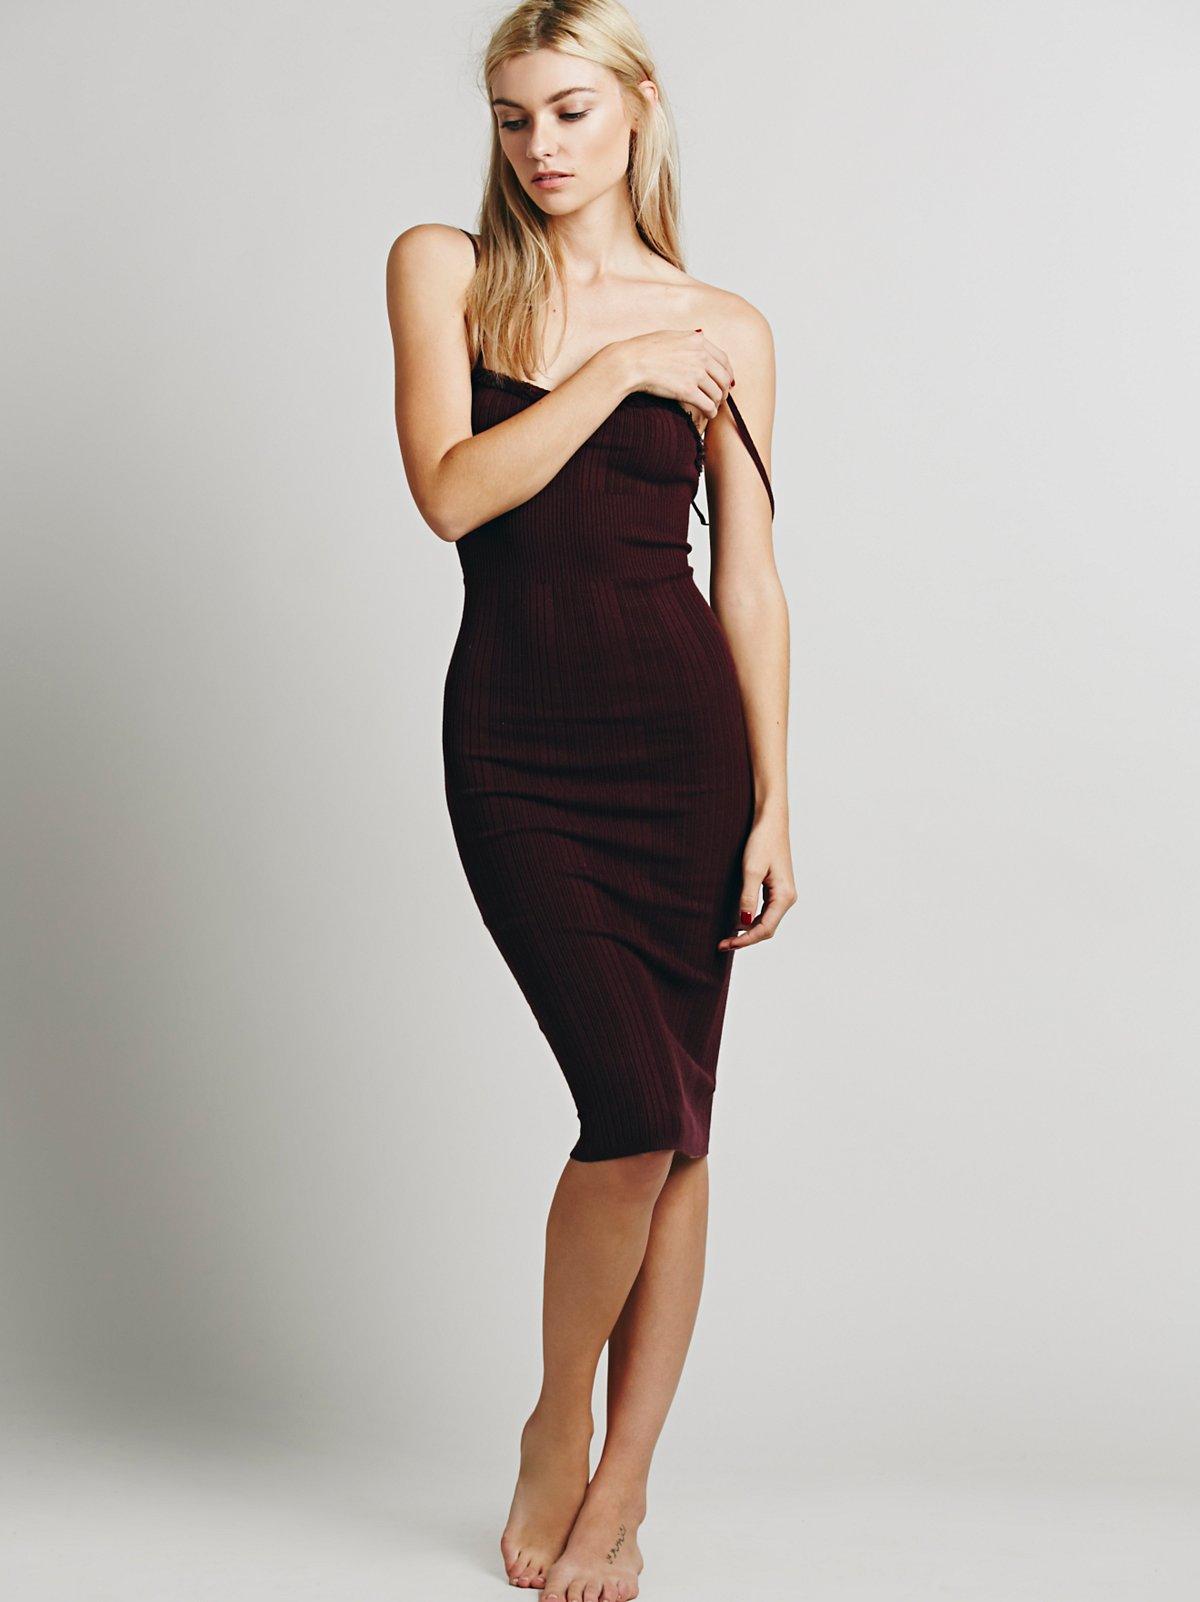 Oh Jeeze Cashmere Night Dress